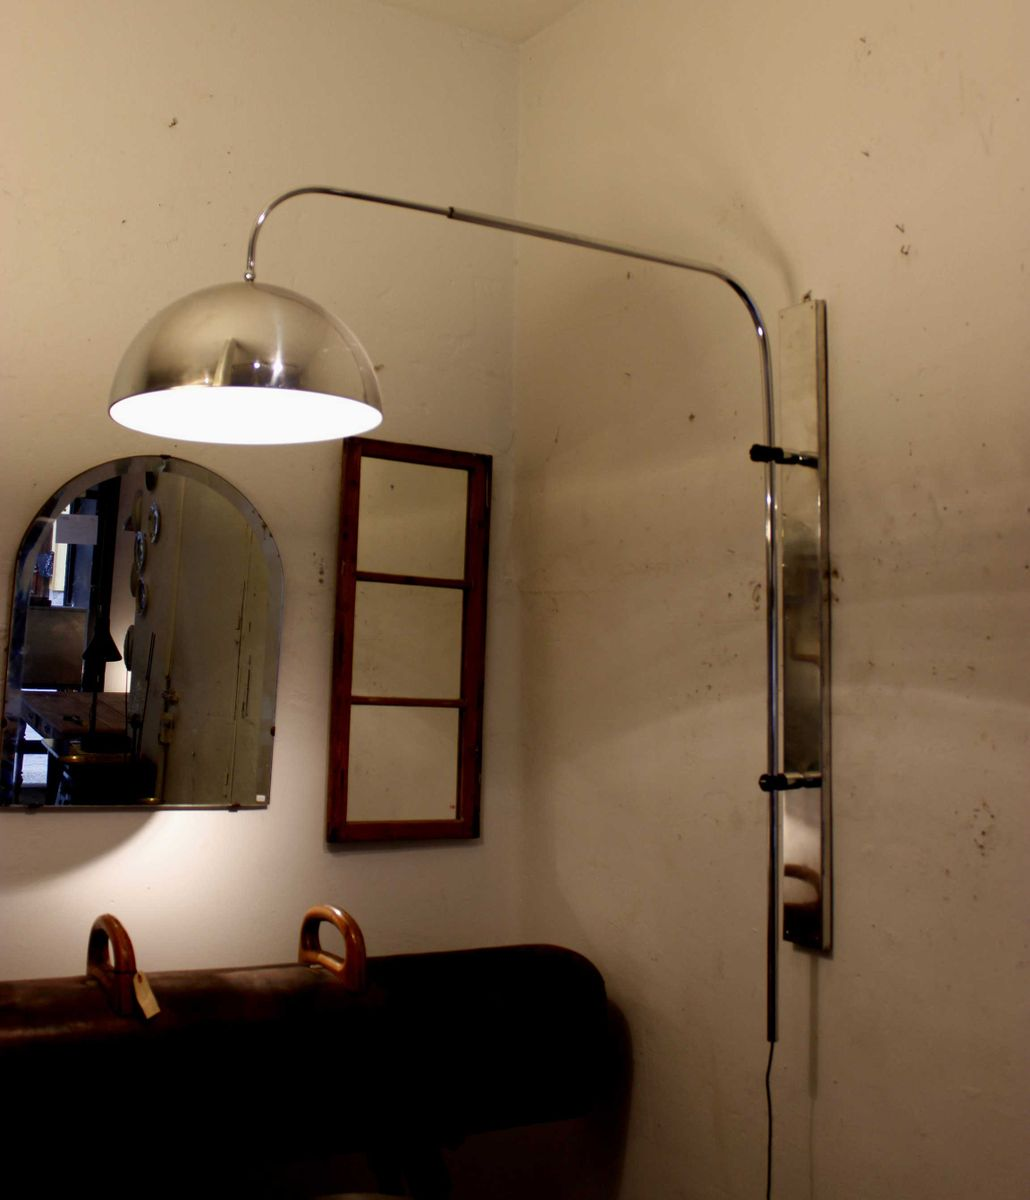 grande applique murale vintage chrom e 1970s en vente sur. Black Bedroom Furniture Sets. Home Design Ideas